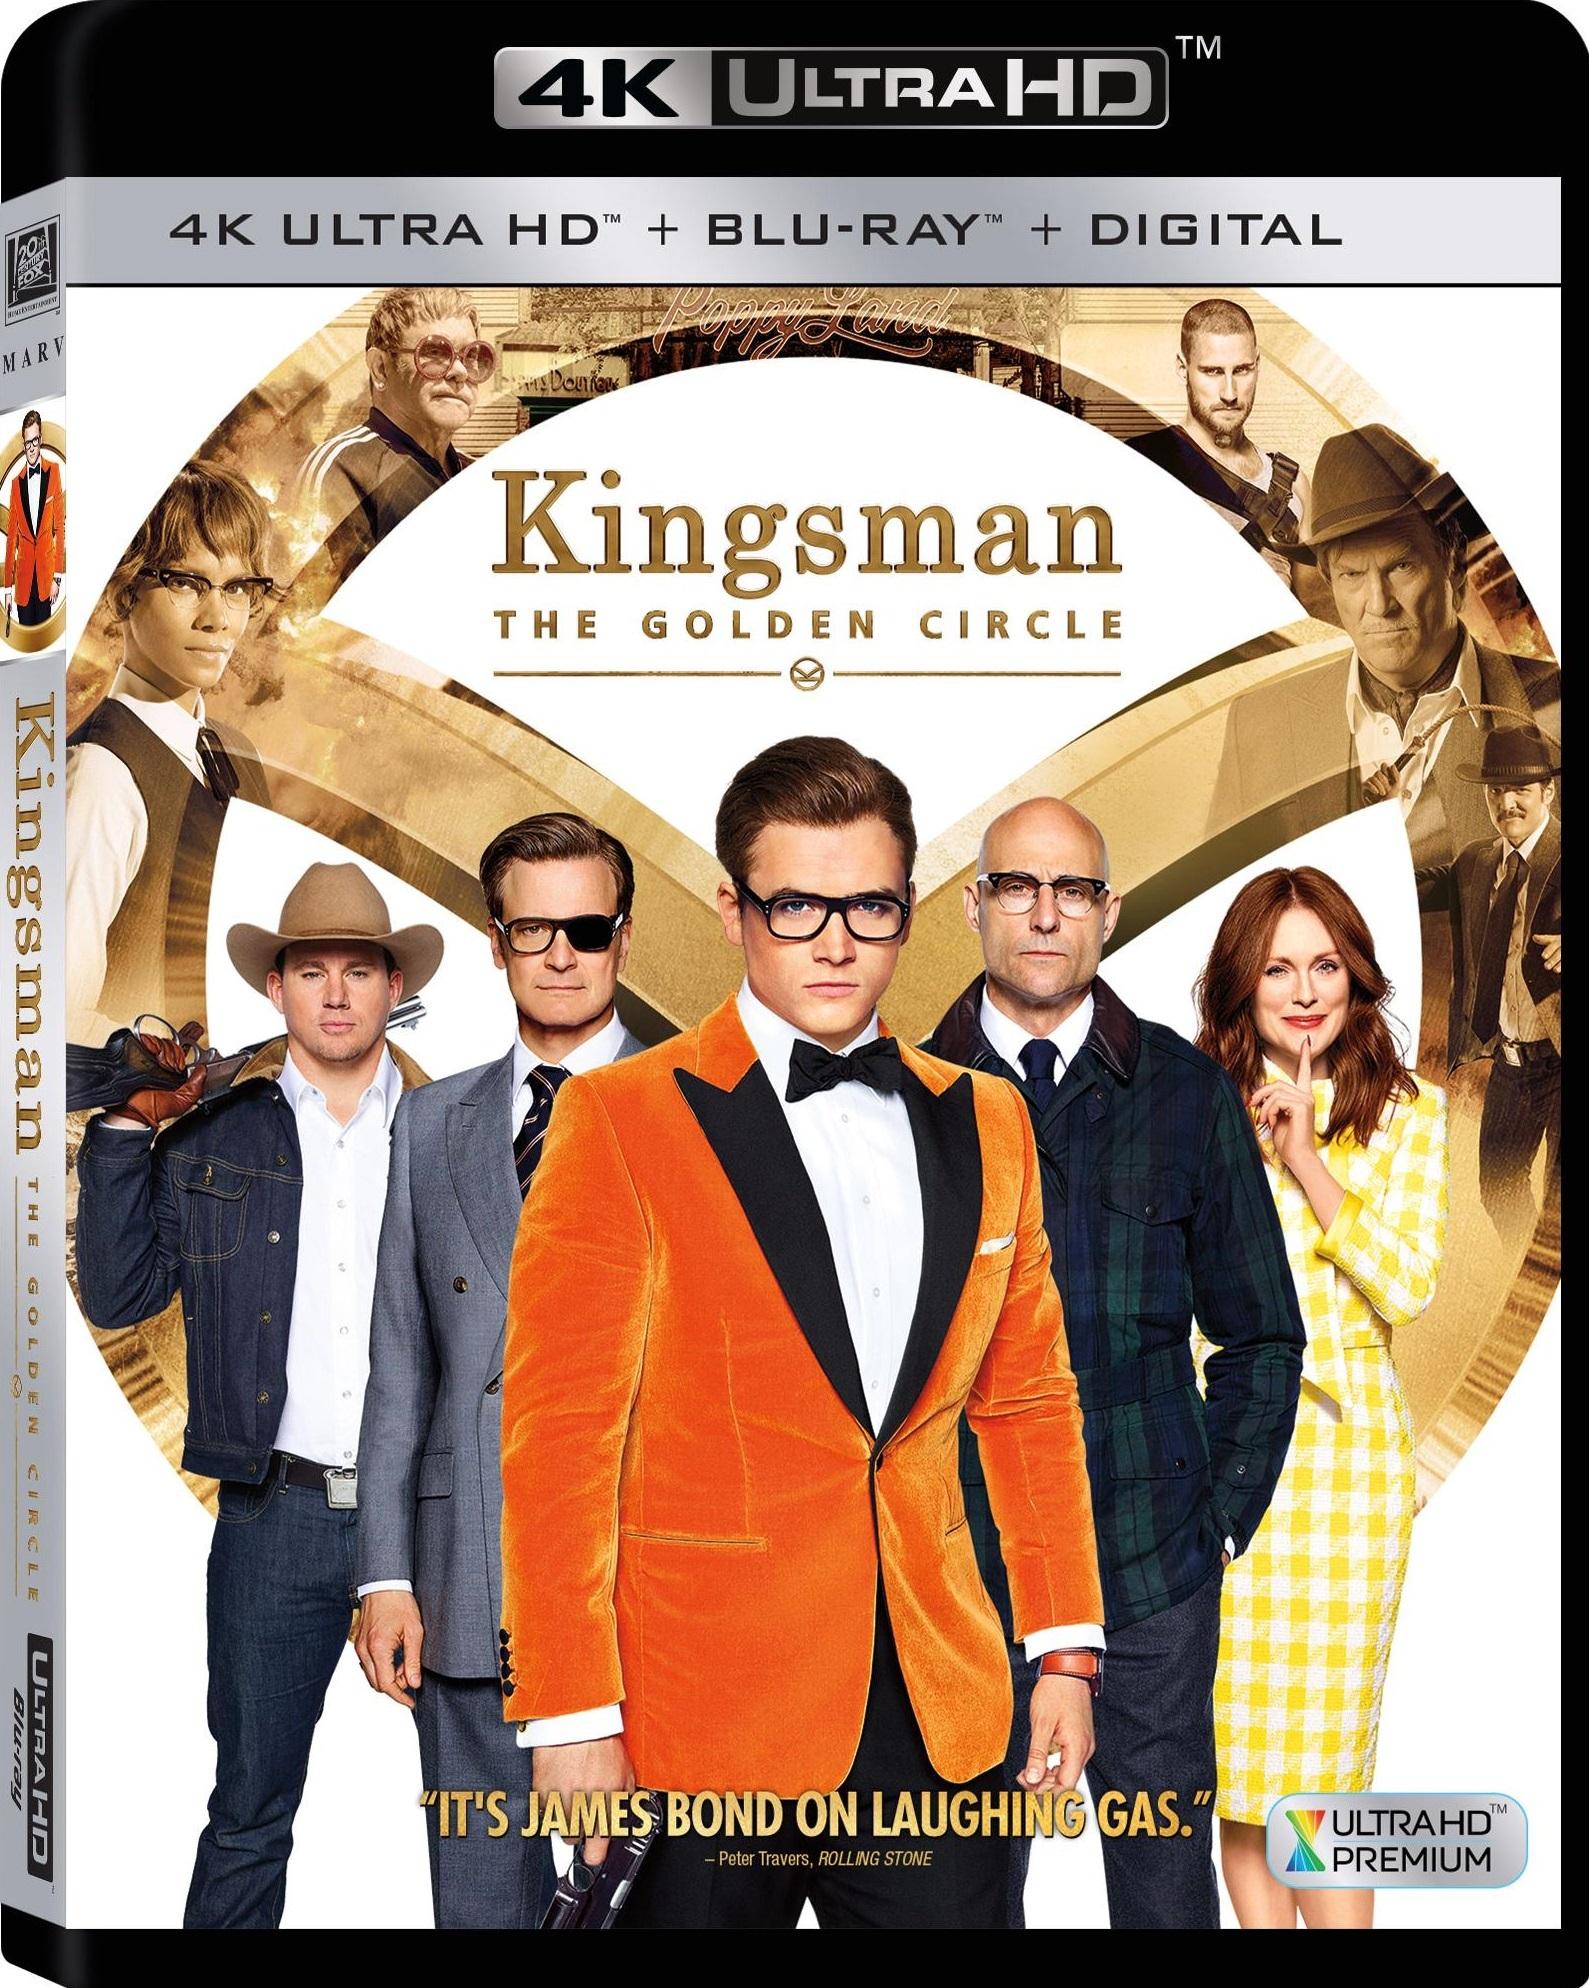 Kingsman: The Golden Circle 4K (2017) UHD Ultra HD Blu-ray